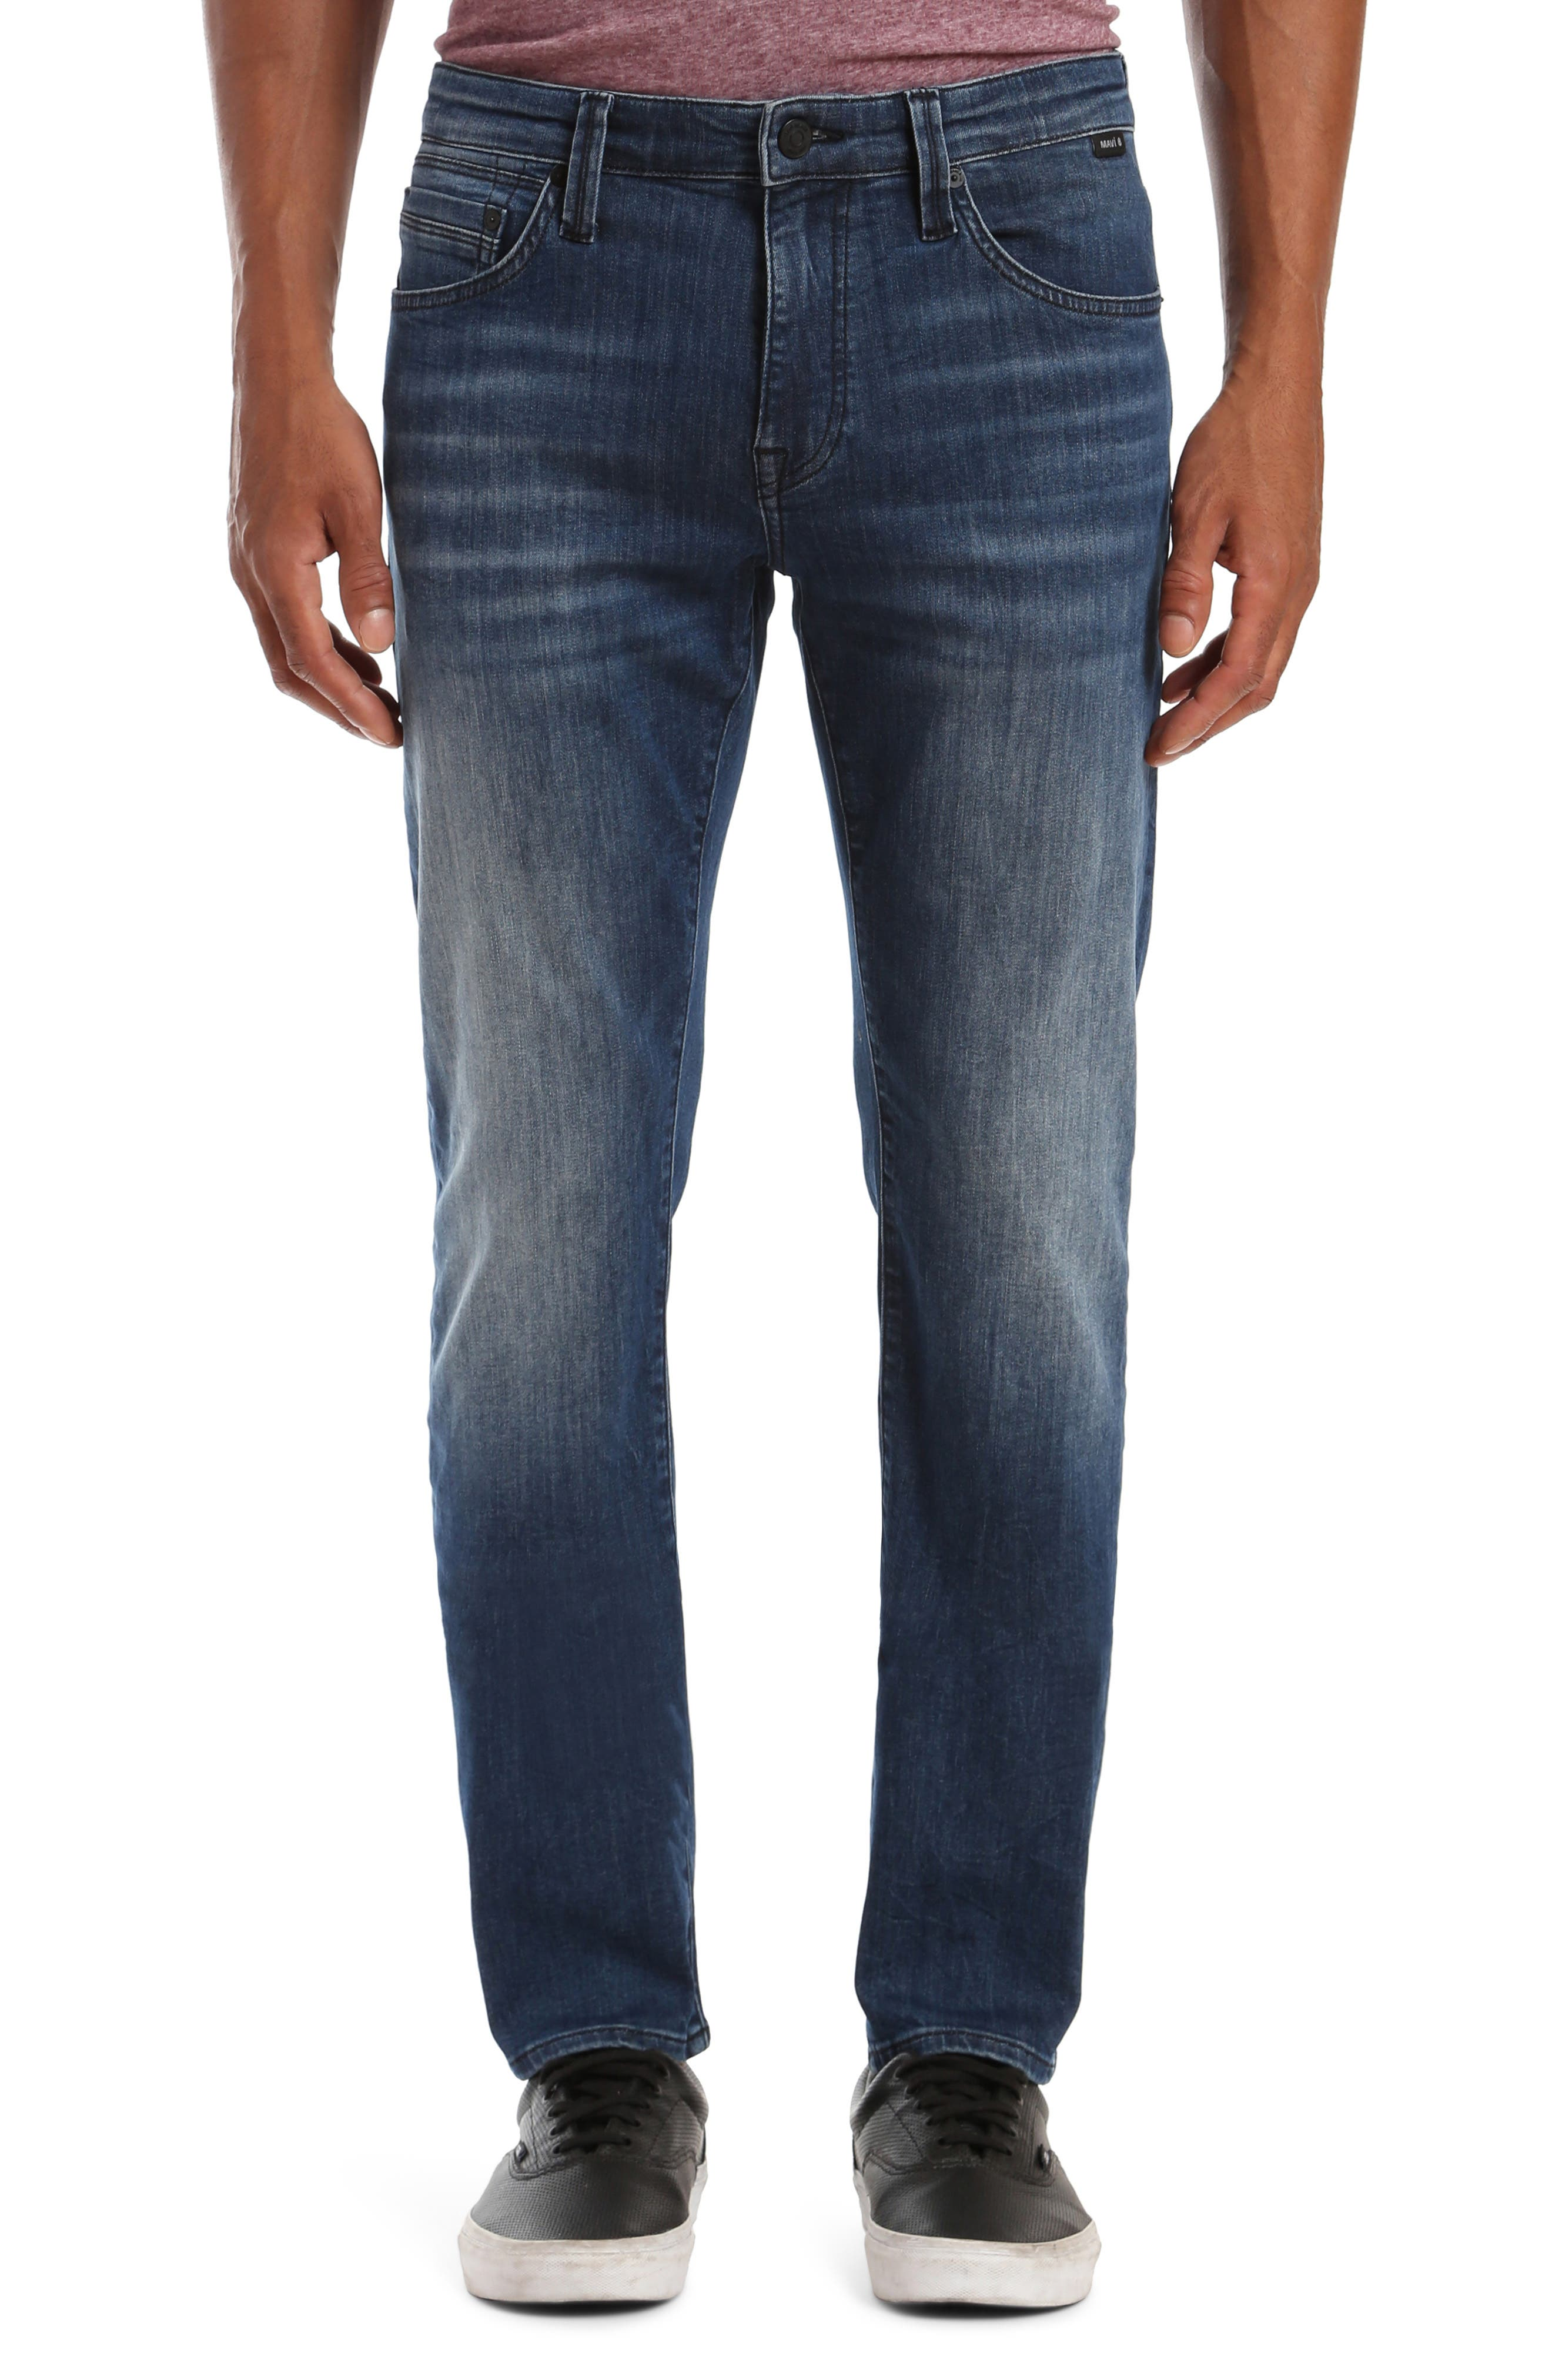 Men's Mavi Jeans Jake Slim Fit Jeans,  28 x 32 - Blue